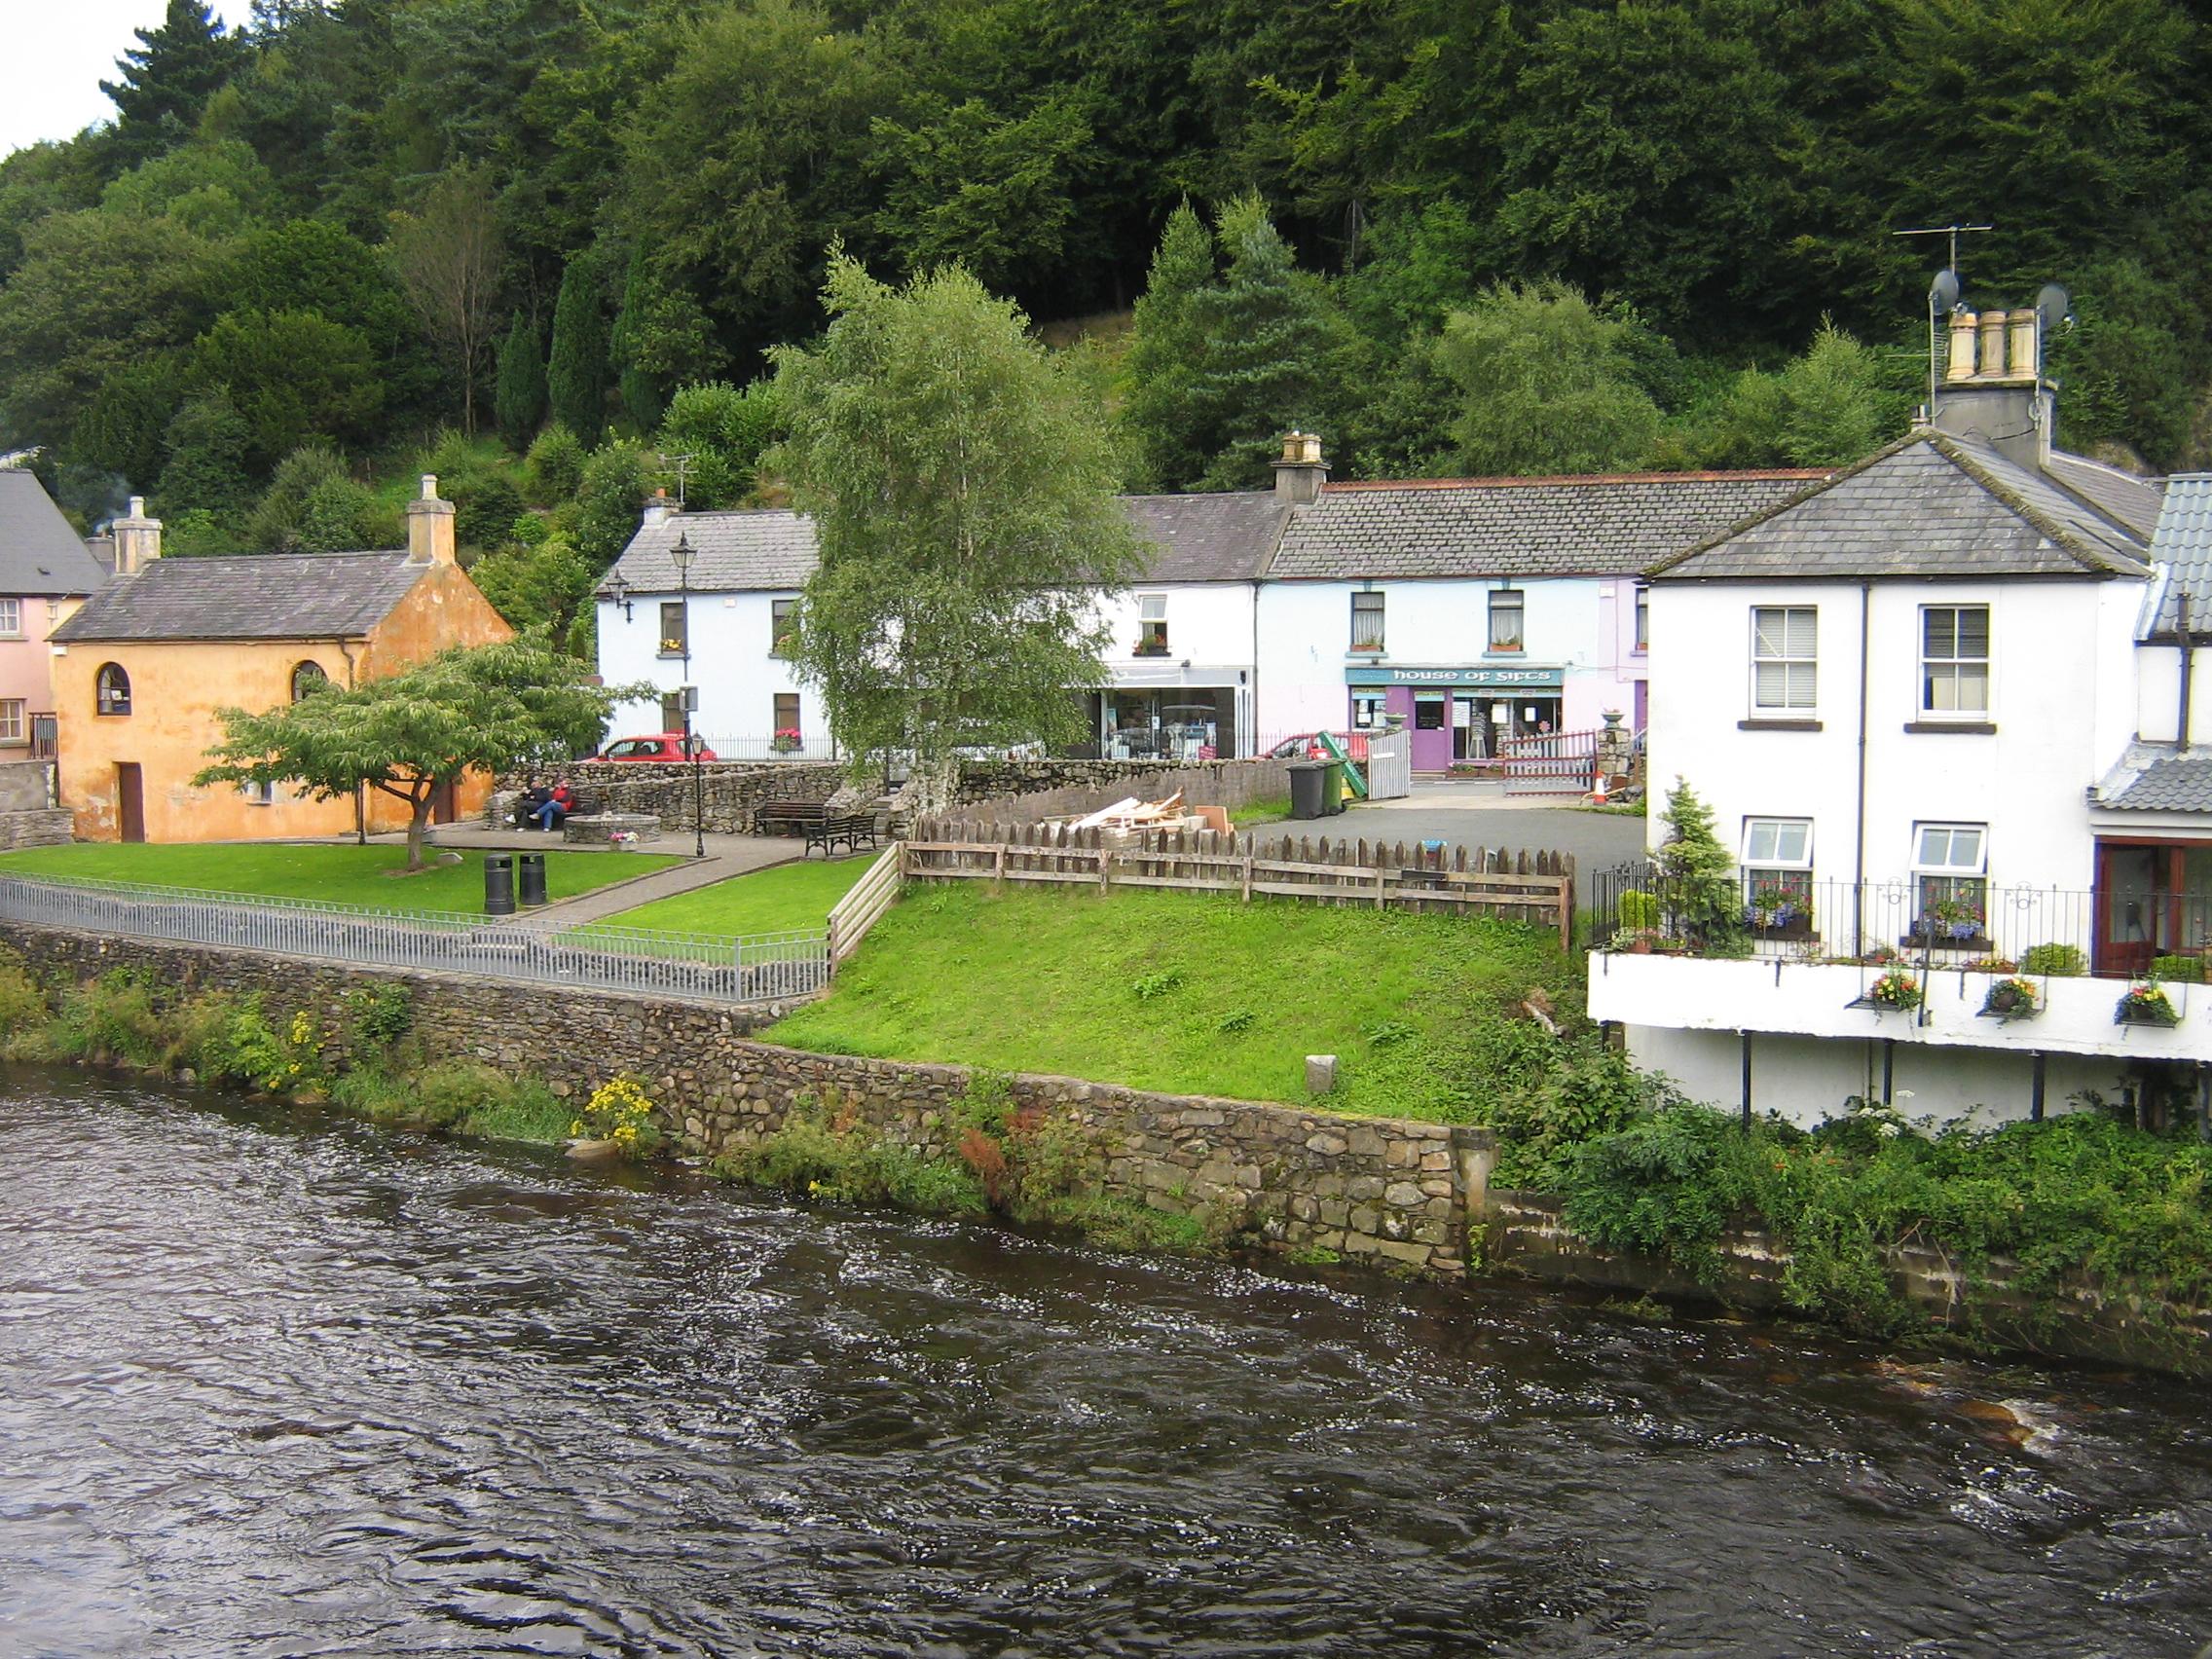 Avoca Ireland  city photo : Description Avoca, County Wicklow in Ireland1